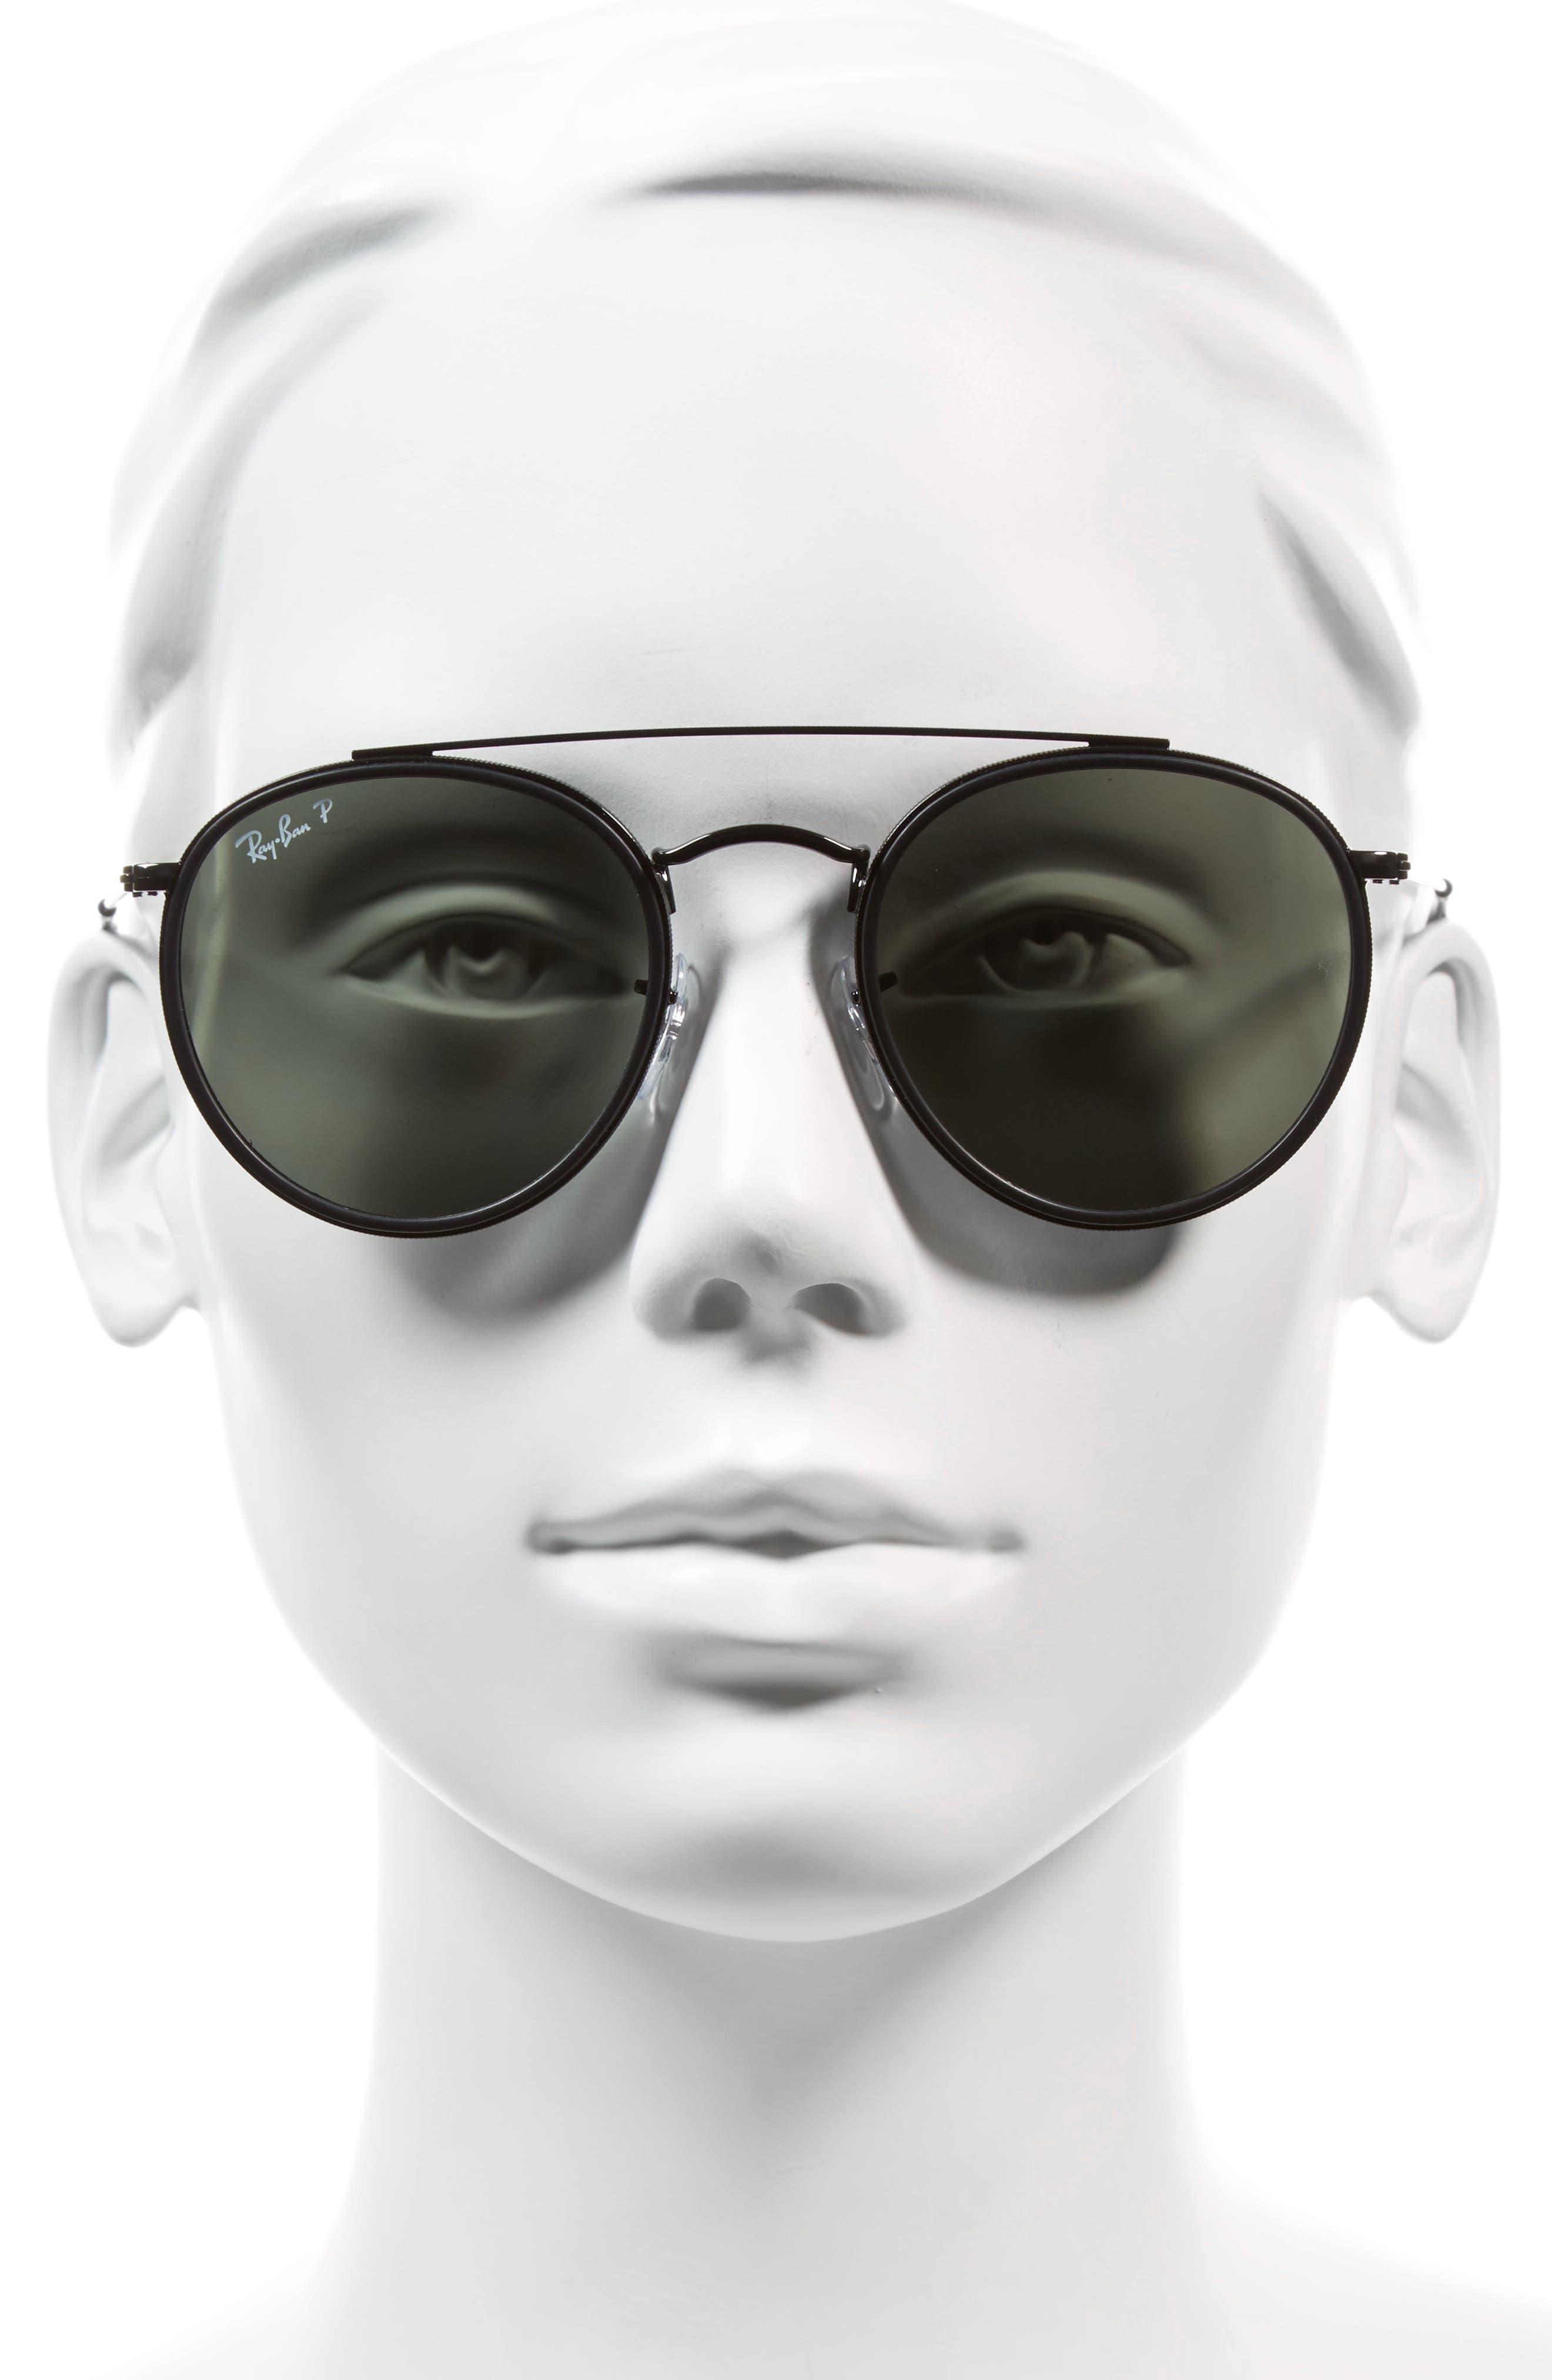 51mm Polarized Round Sunglasses,                             Alternate thumbnail 3, color,                             001